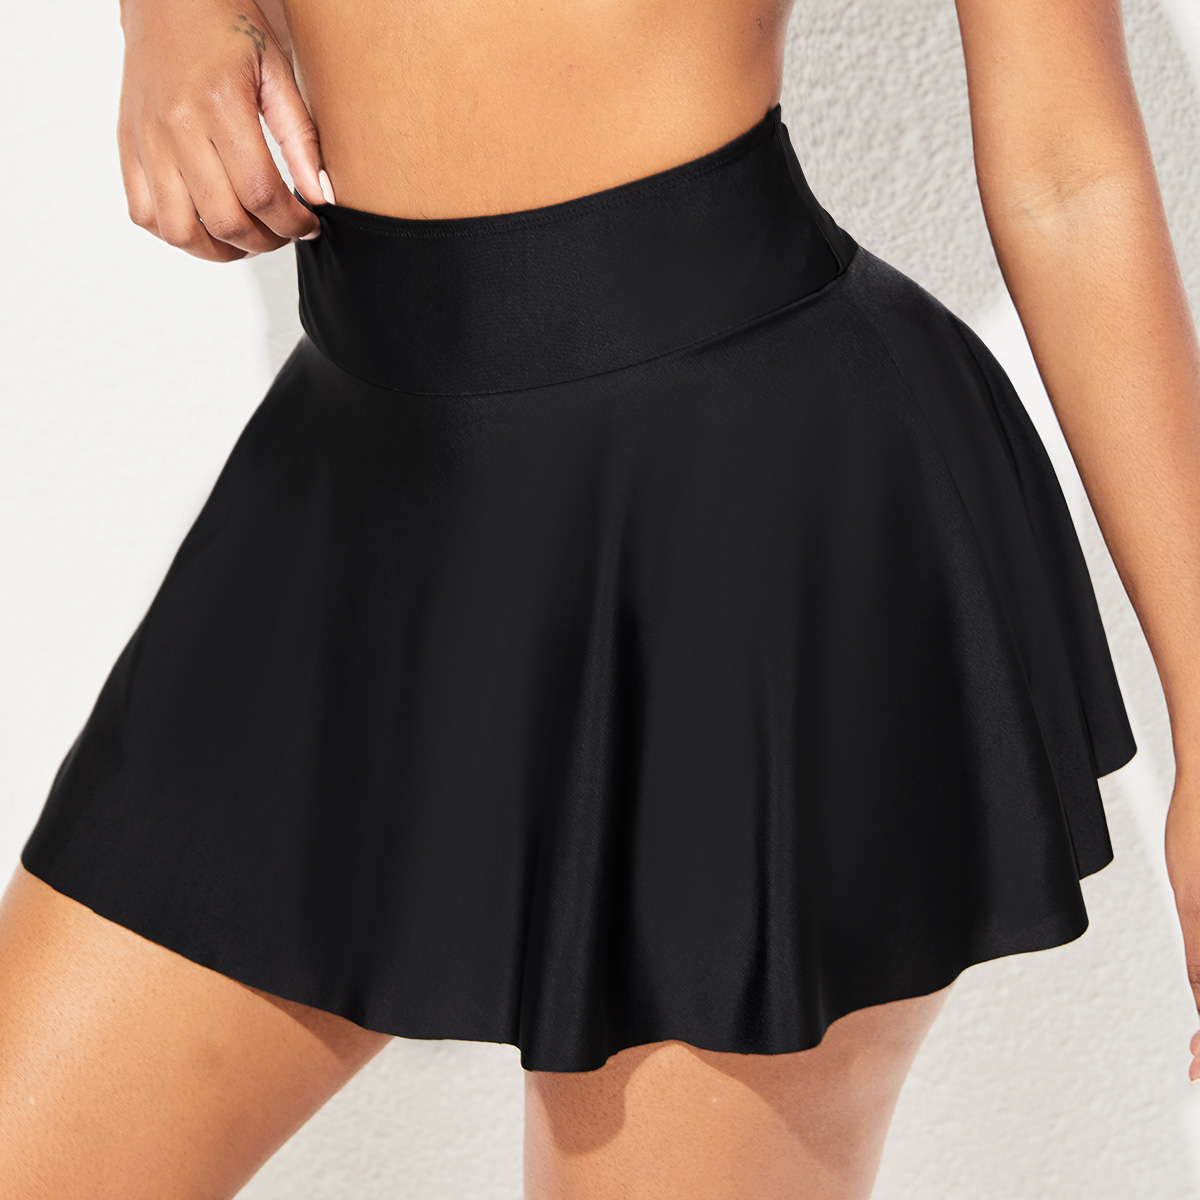 Elastic Detail High Waist Solid Swim Skirt